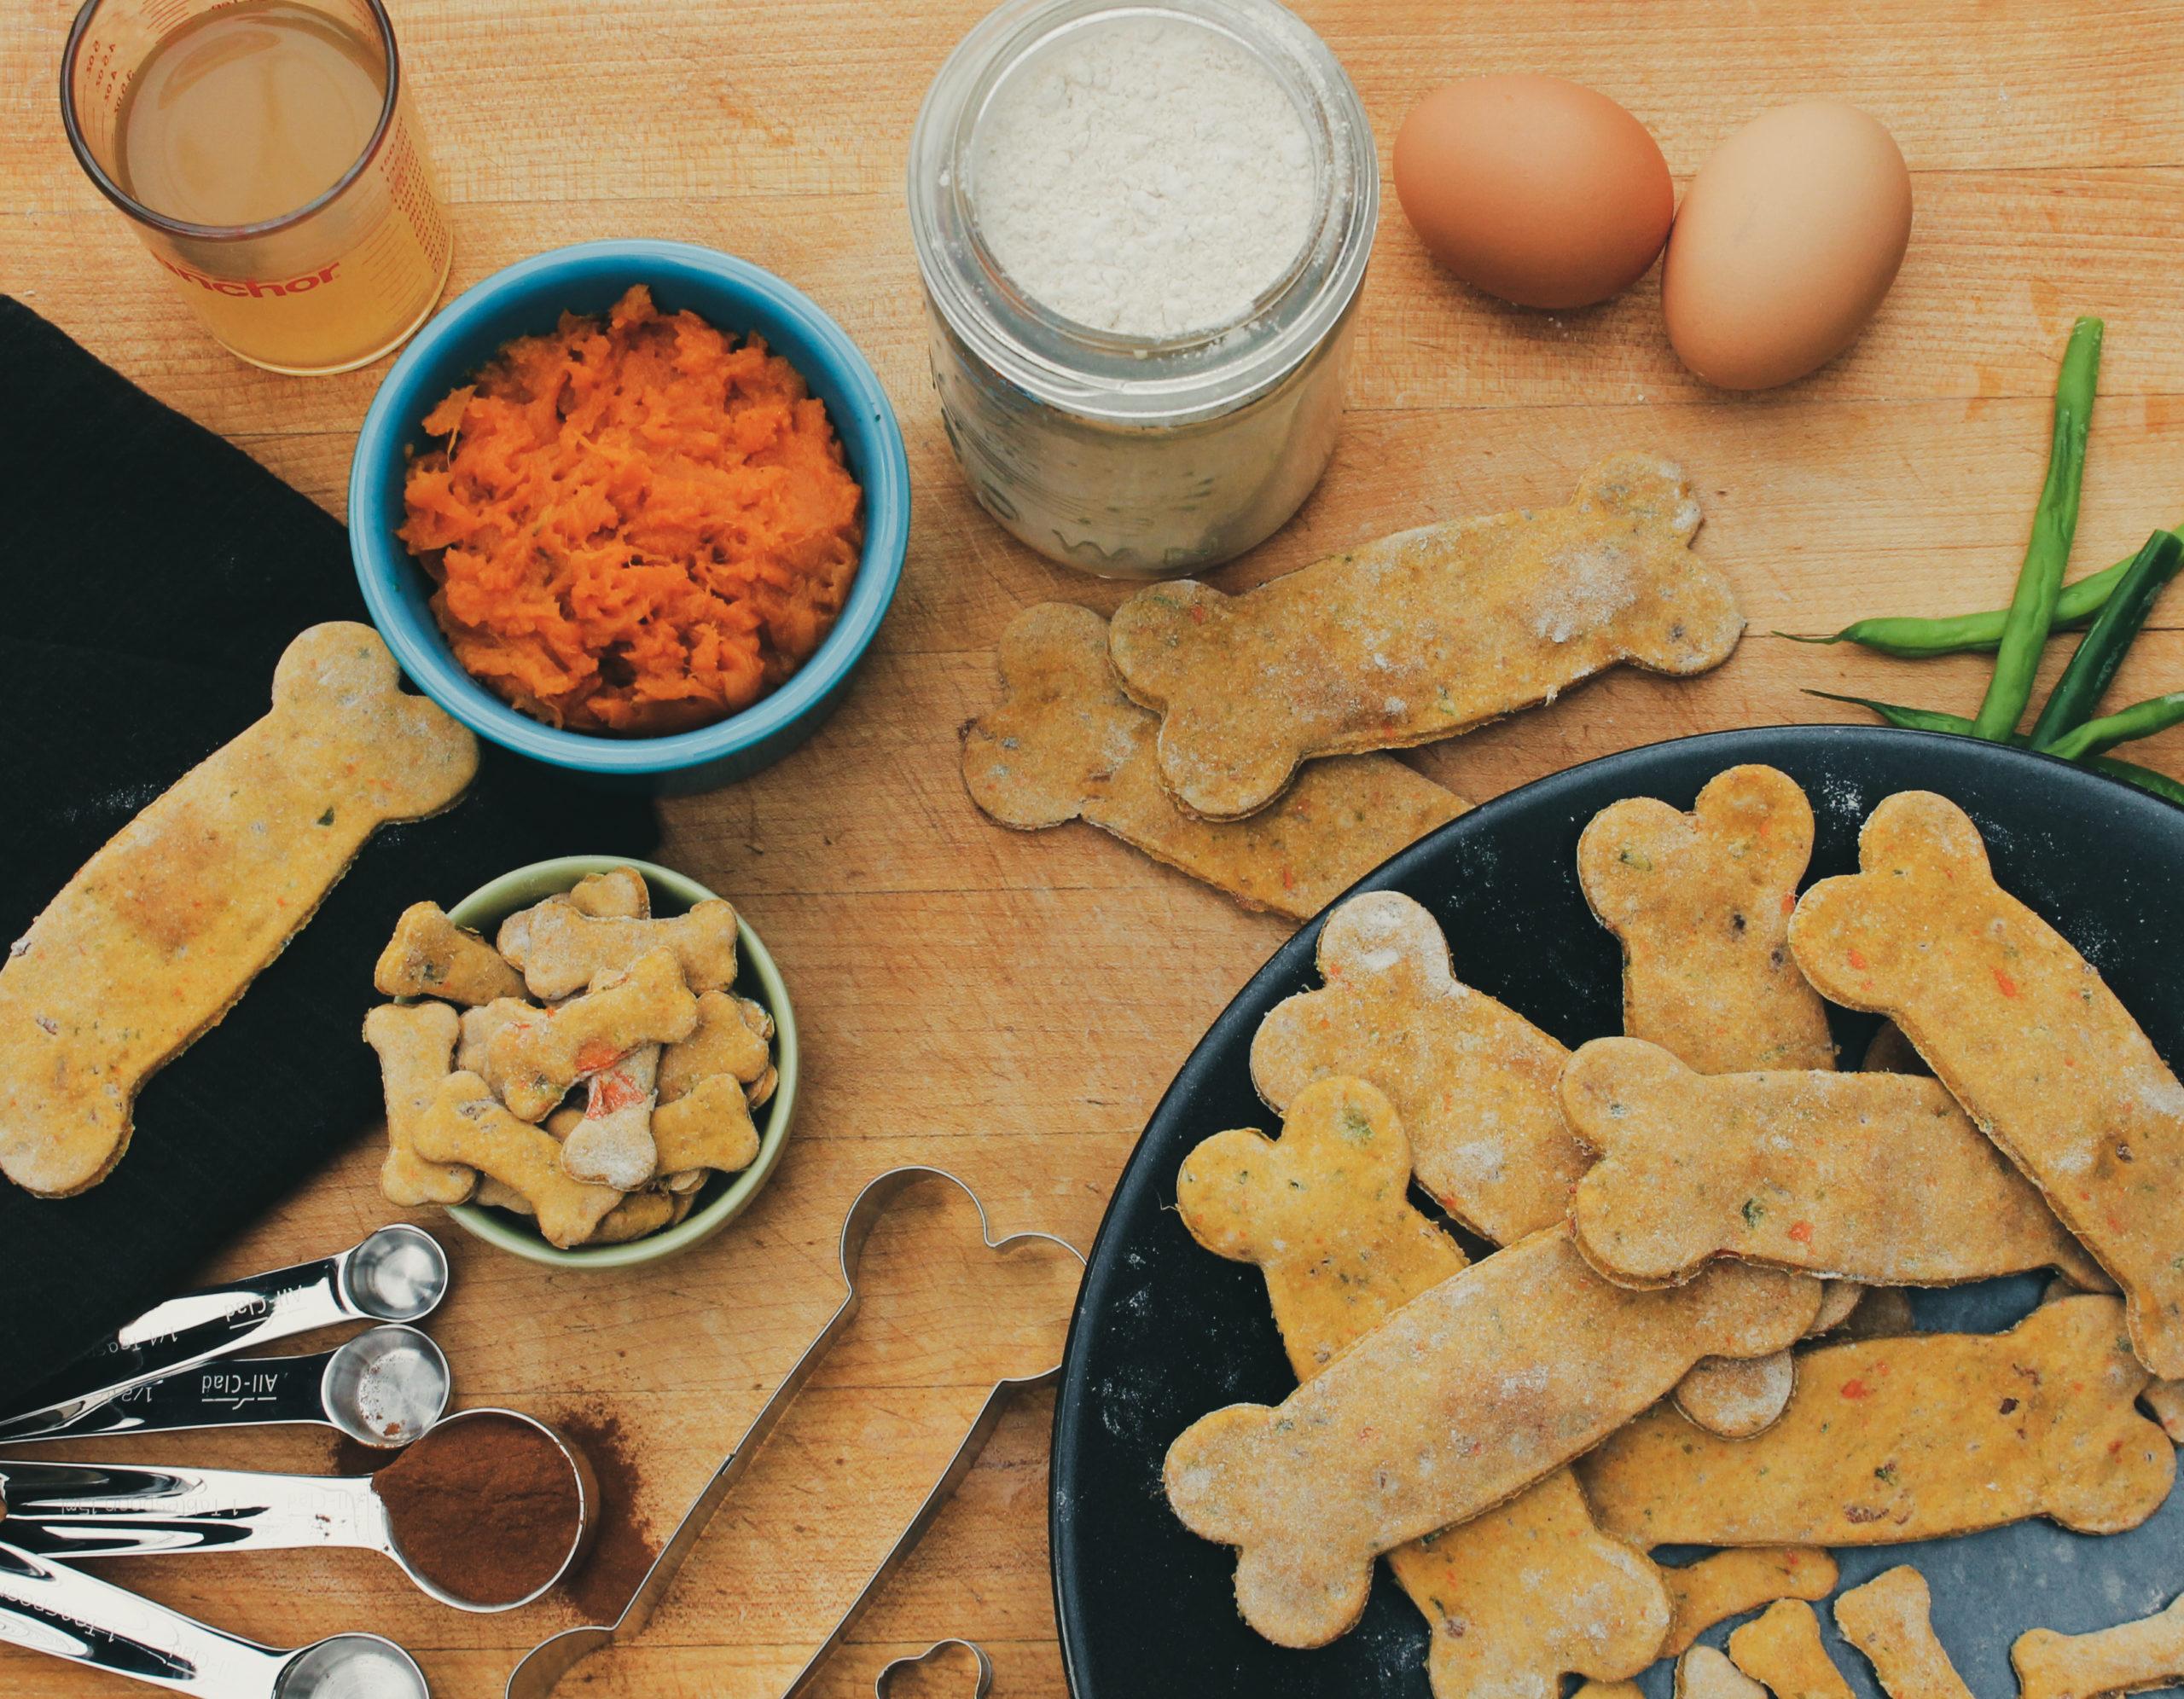 Homemade dog treats made out of sweet potato